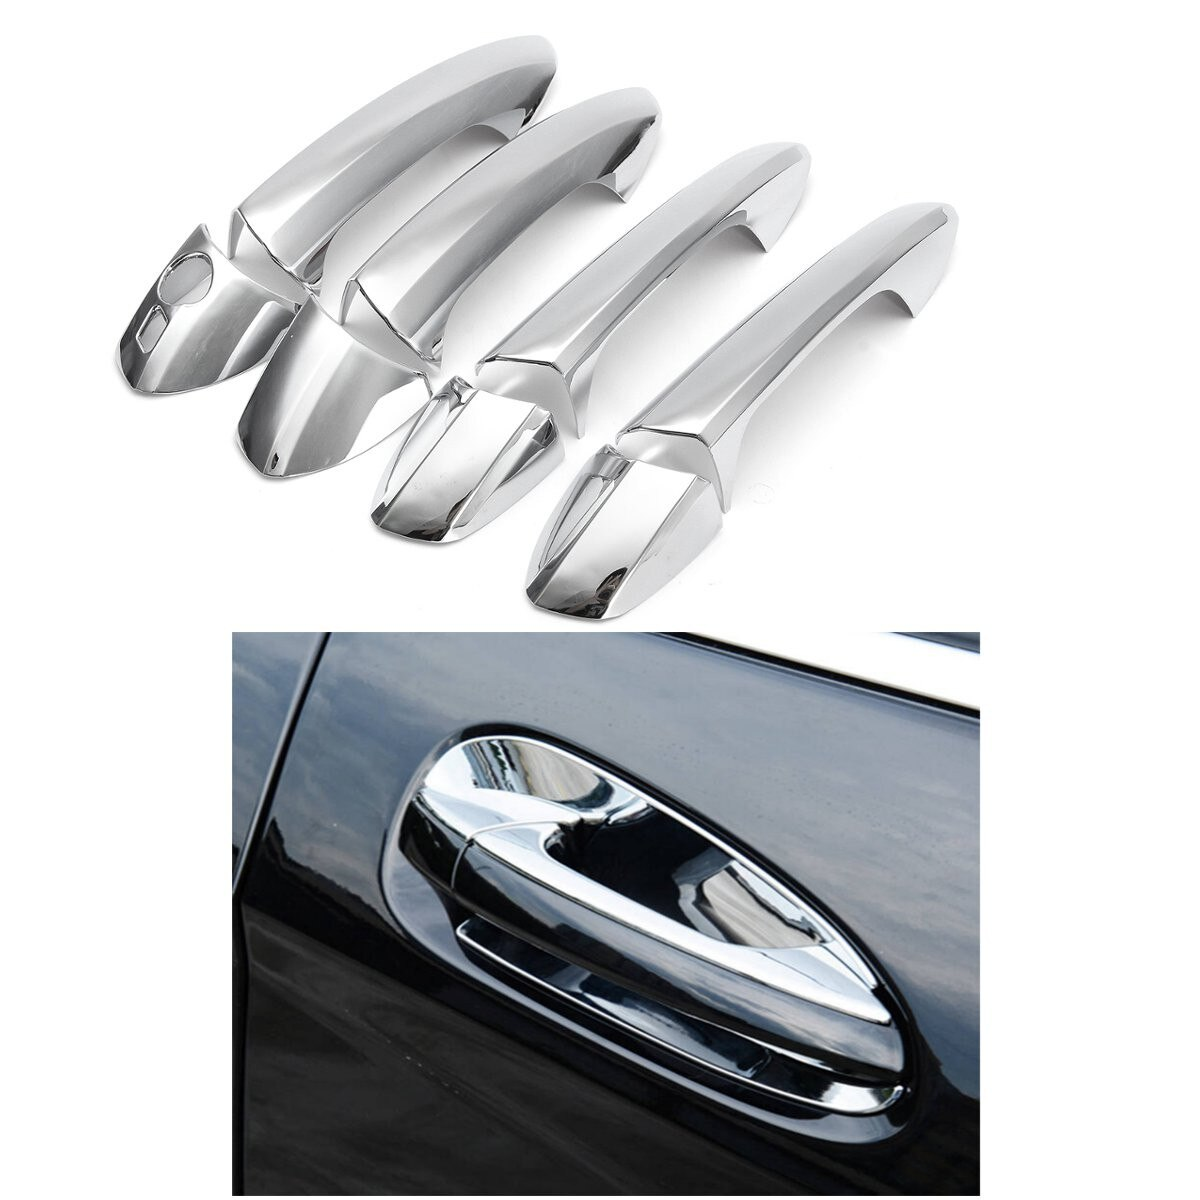 8 шт./компл. ABS хромированные боковые дверные ручки крышки Накладка для Mercedes-Benz B/C/E/GLK/ML/CLA W246 W204 W212 X204 W166 W117